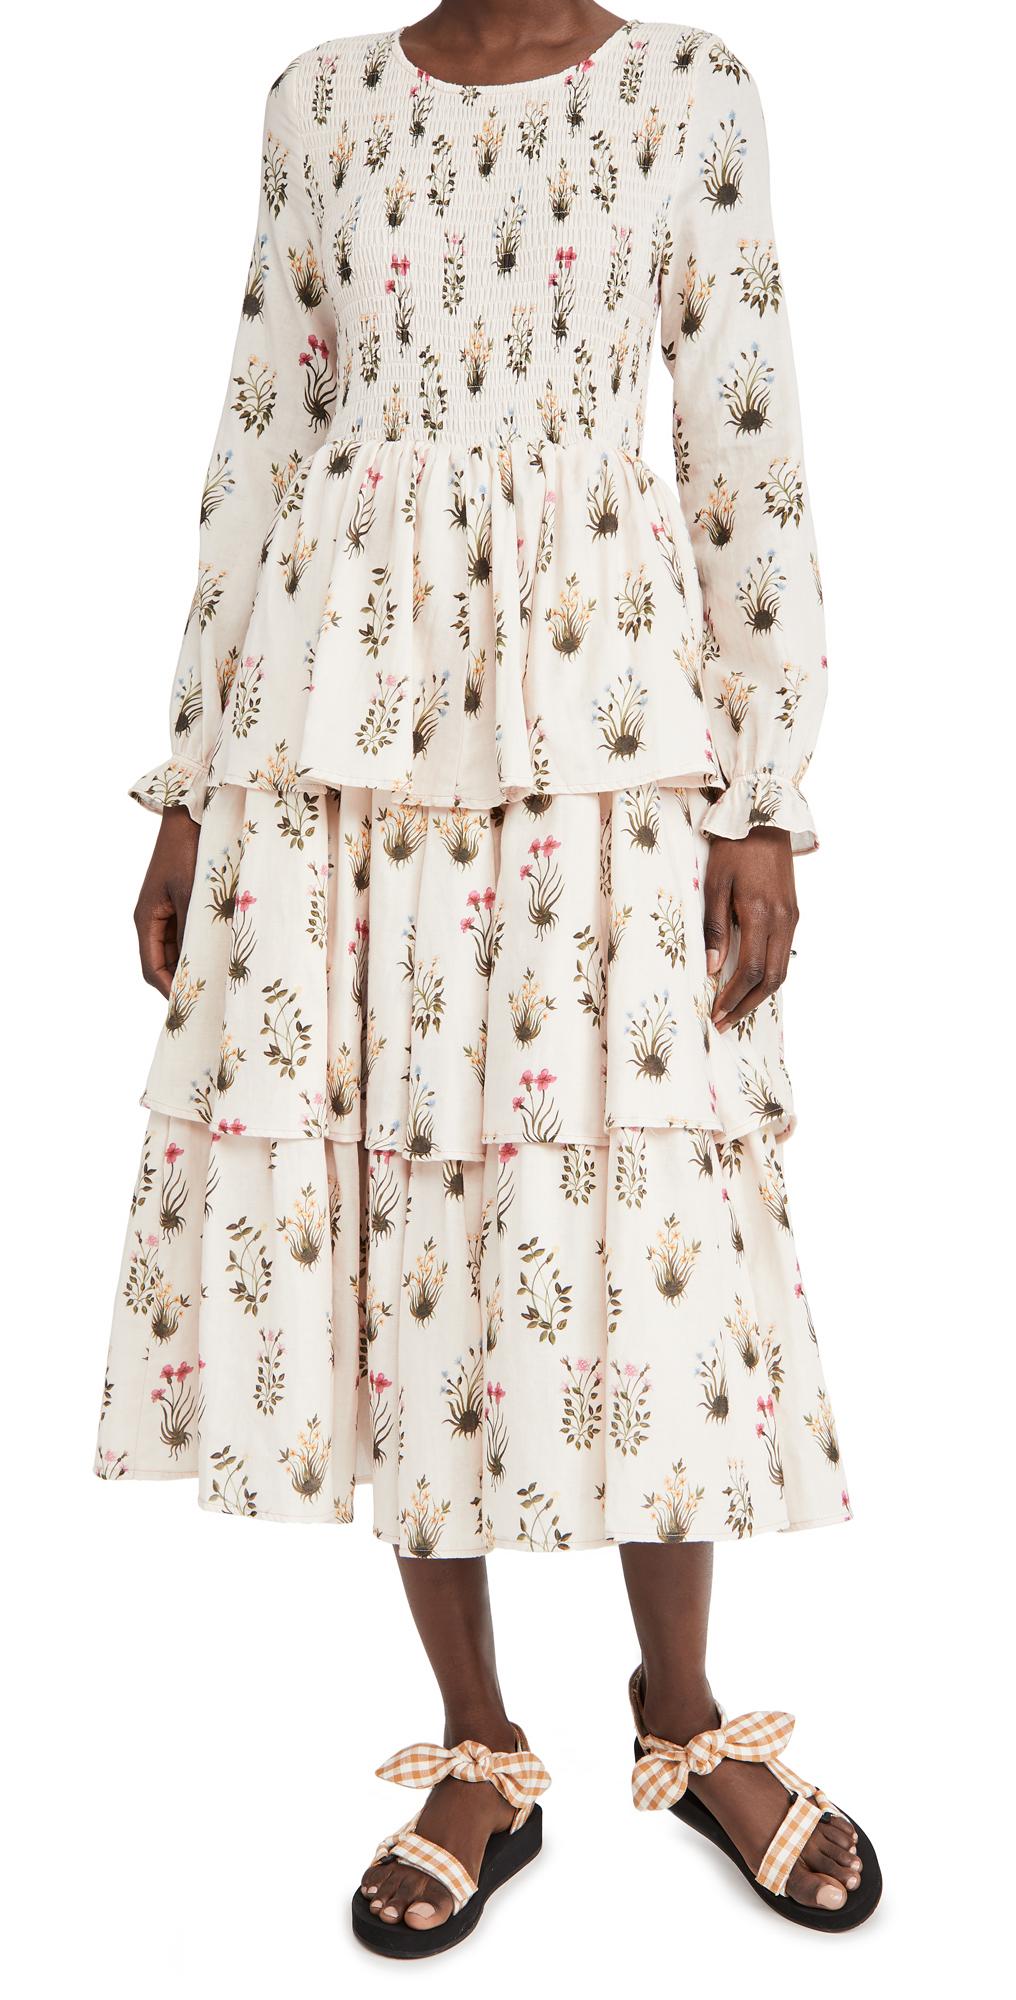 Meadows Bellerose Dress